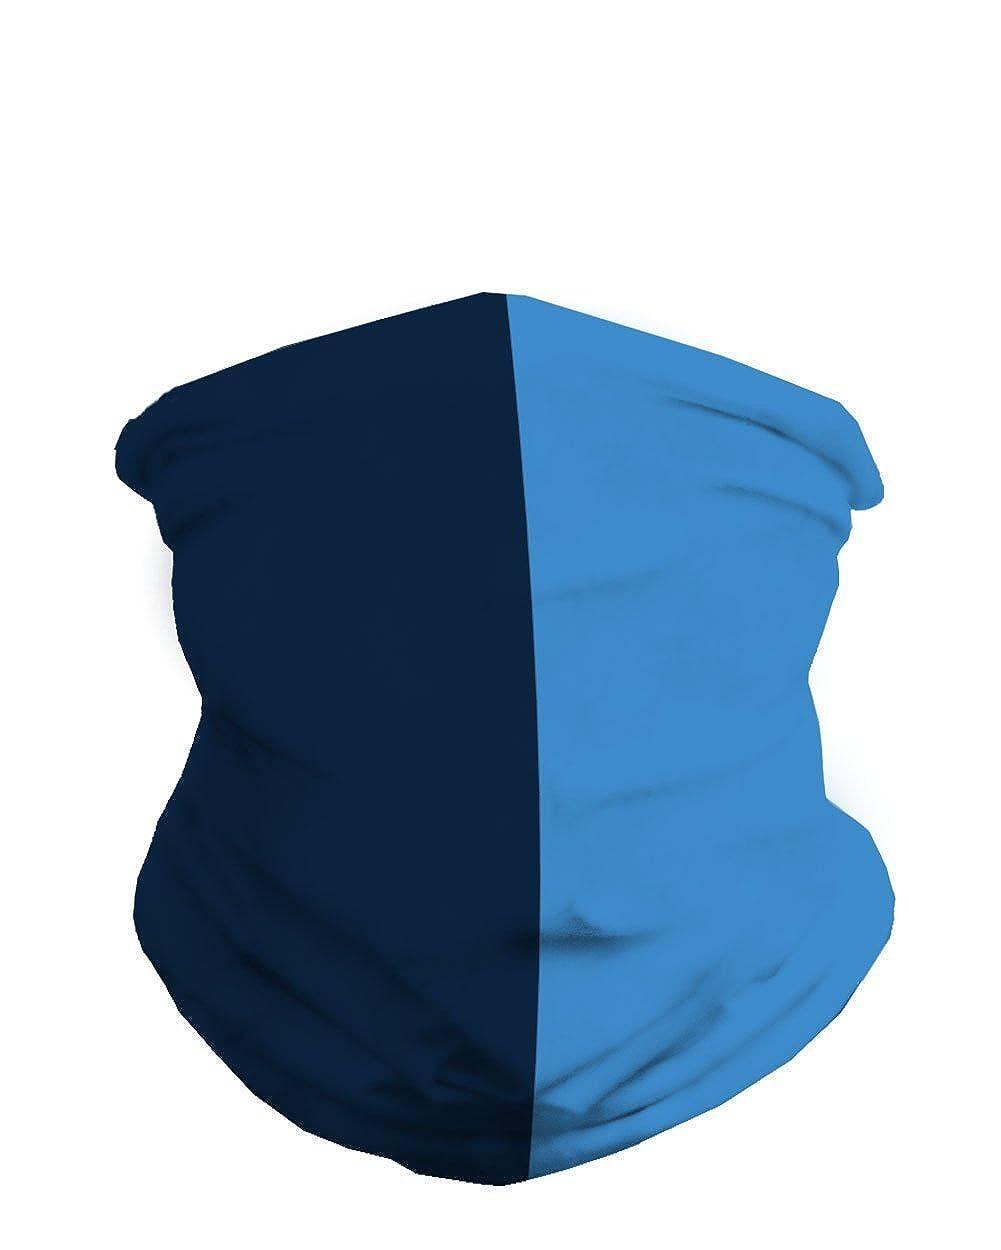 INTO THE AM Seamless Sports Fan Masks - Football, Basketball Team Colors Bandanas AM7566-32-OS